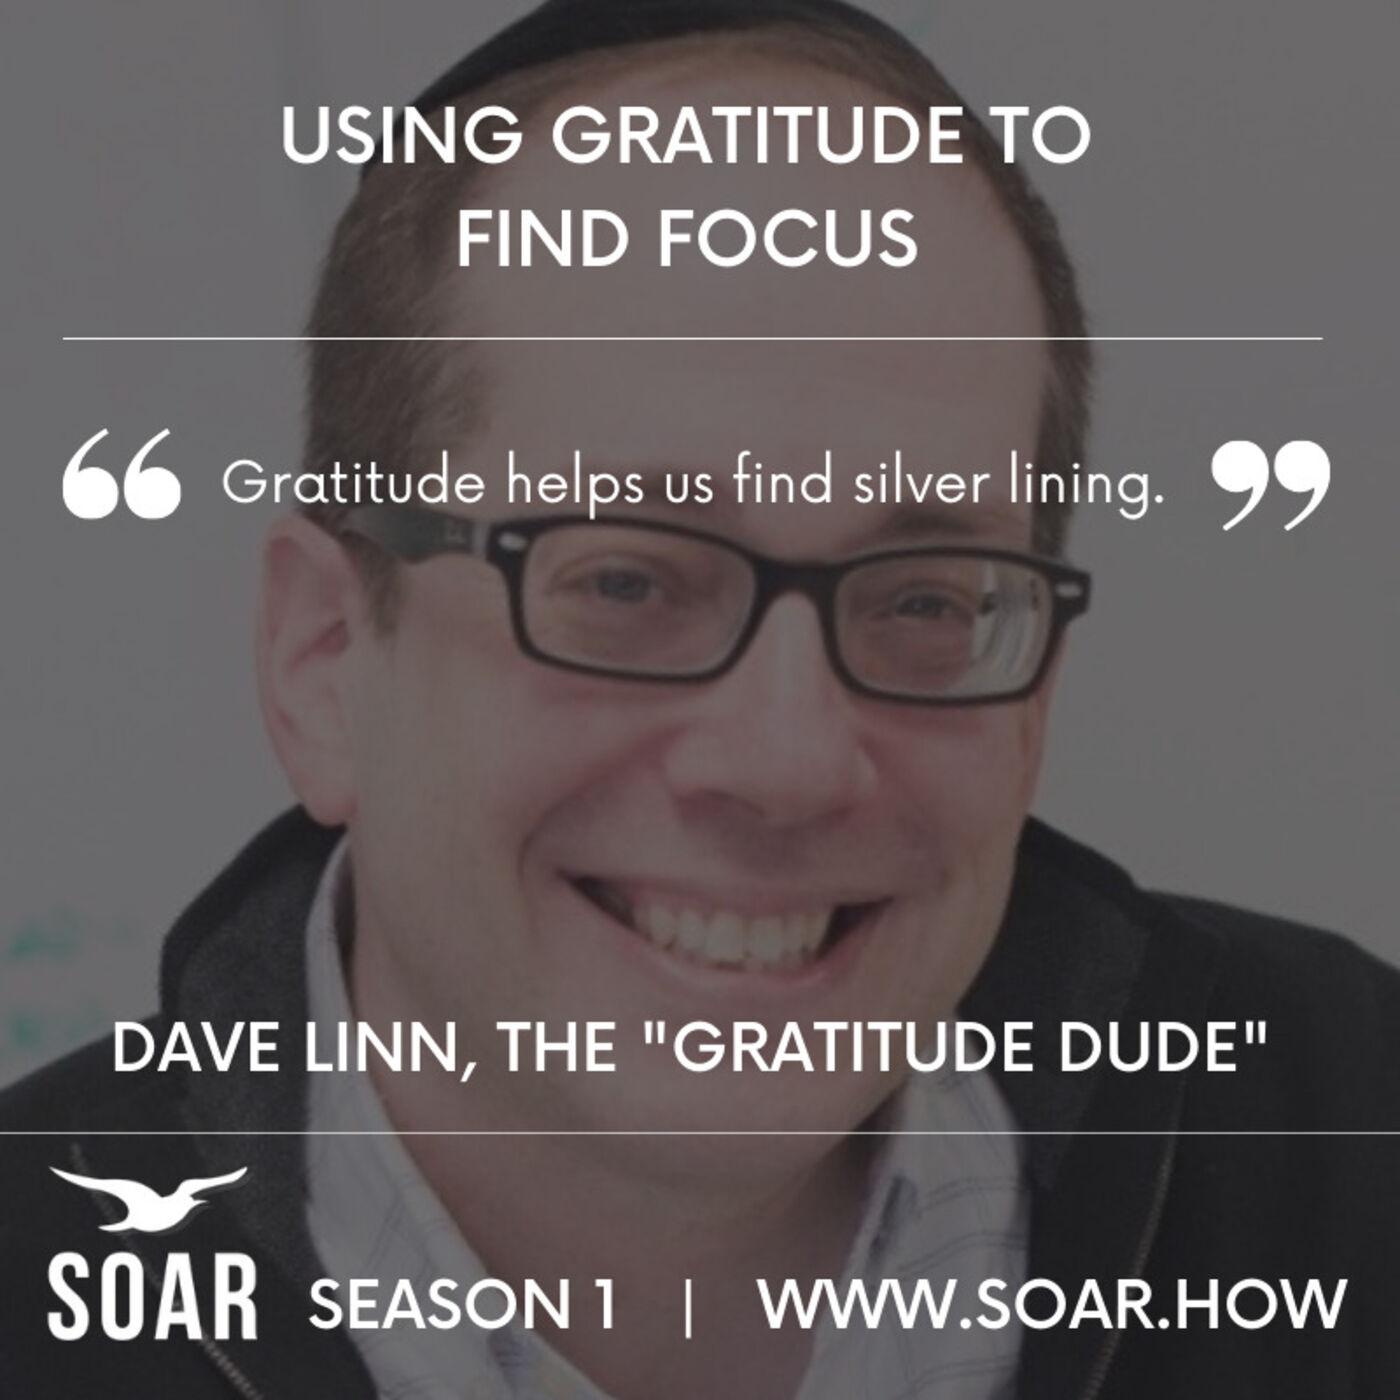 How Gratitude Can Help You Focus